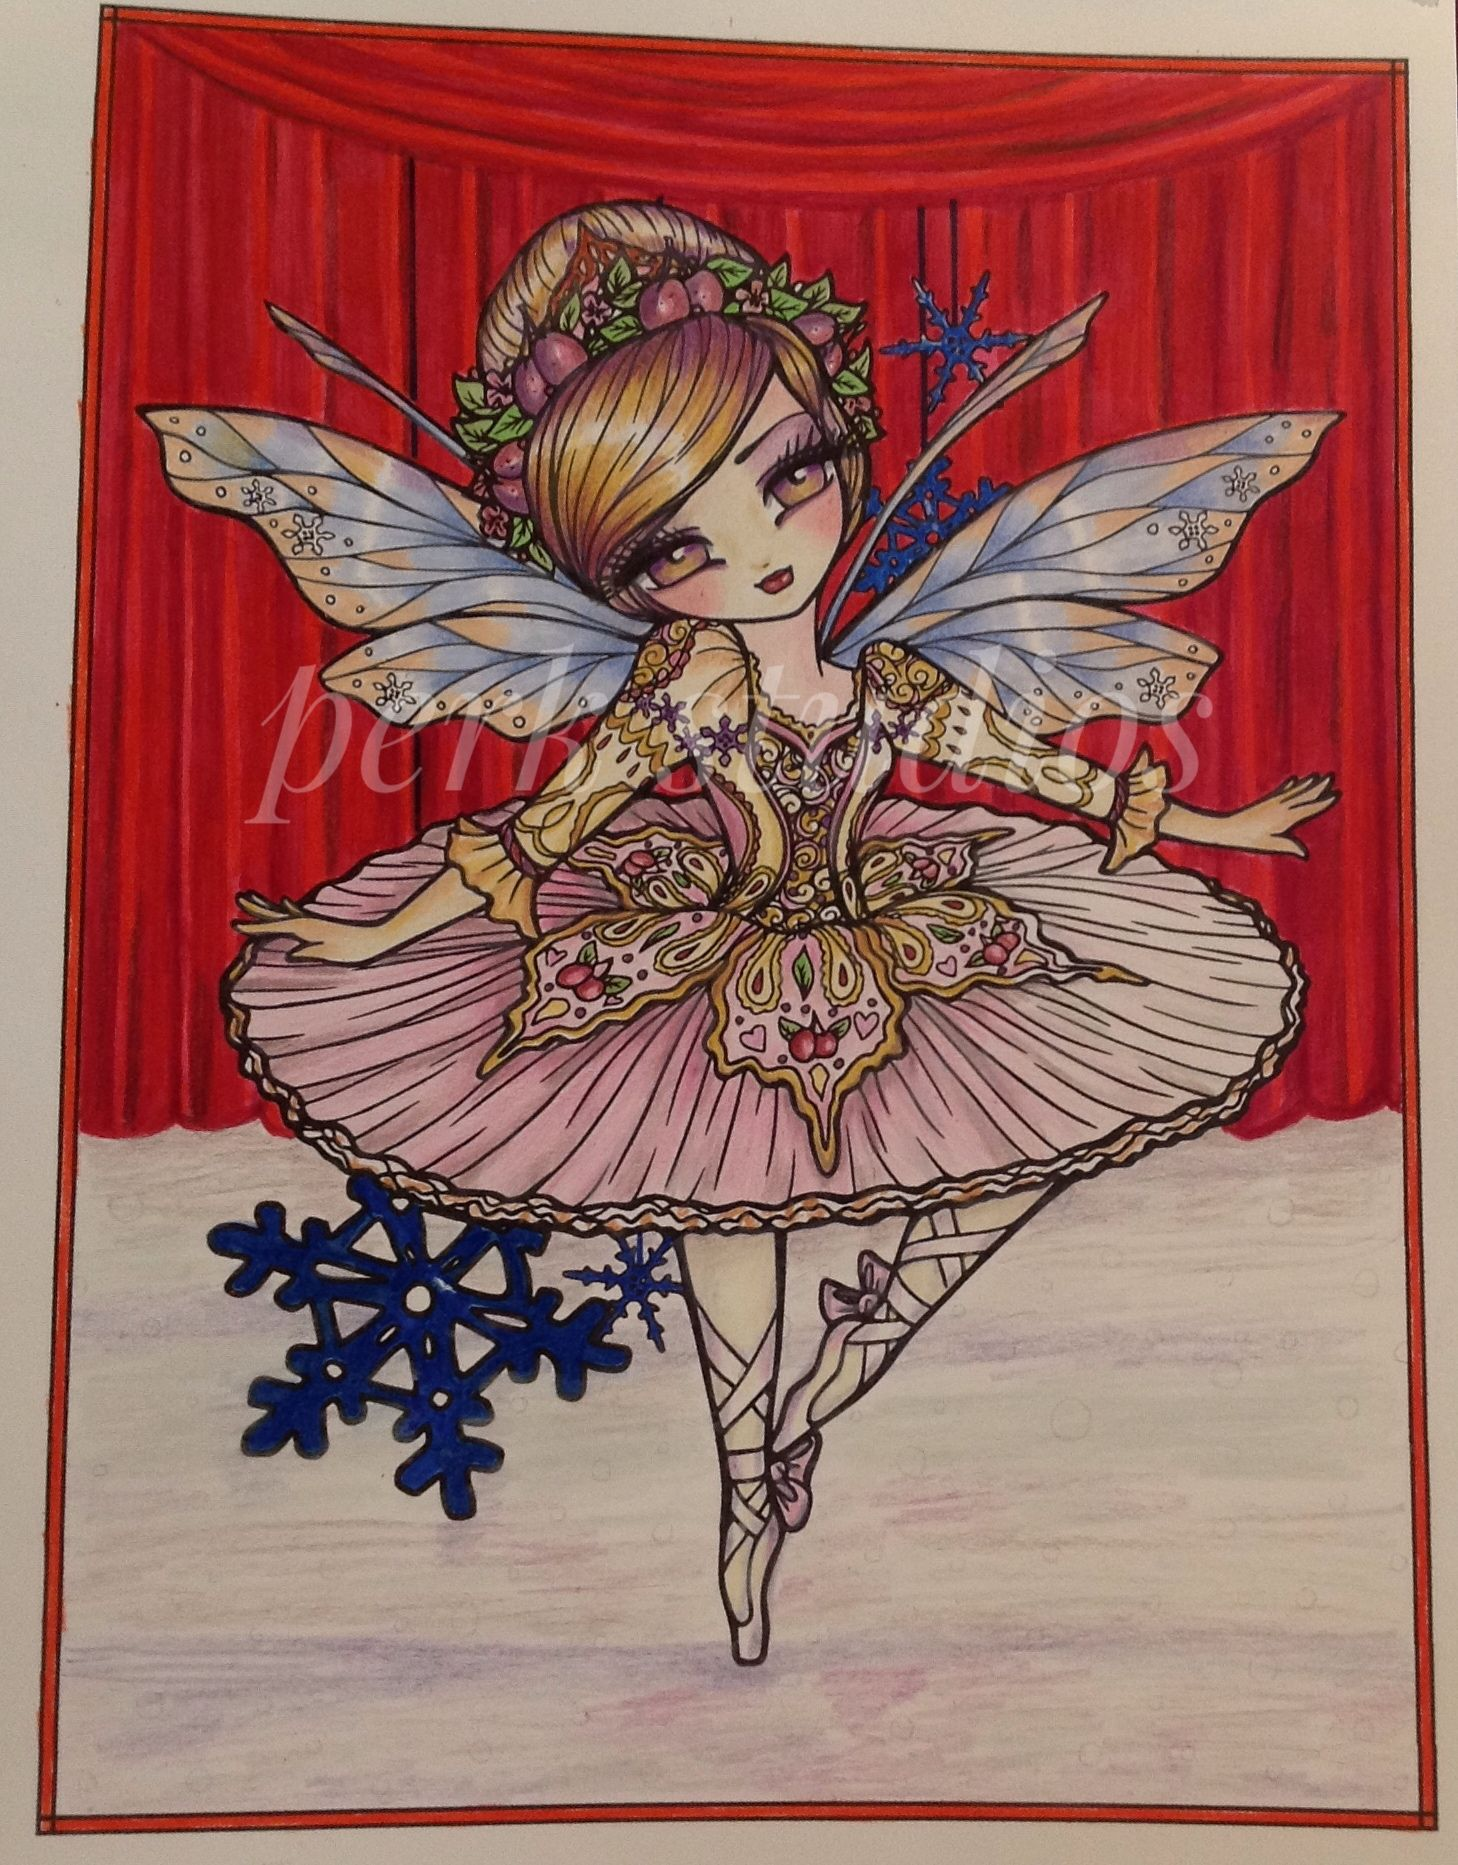 Sugar Plum Fairy Hannah Lynn A Whimsy Girl S Christmas Perk Studios Hannah Lynn Christmas Girl Christmas Coloring Books